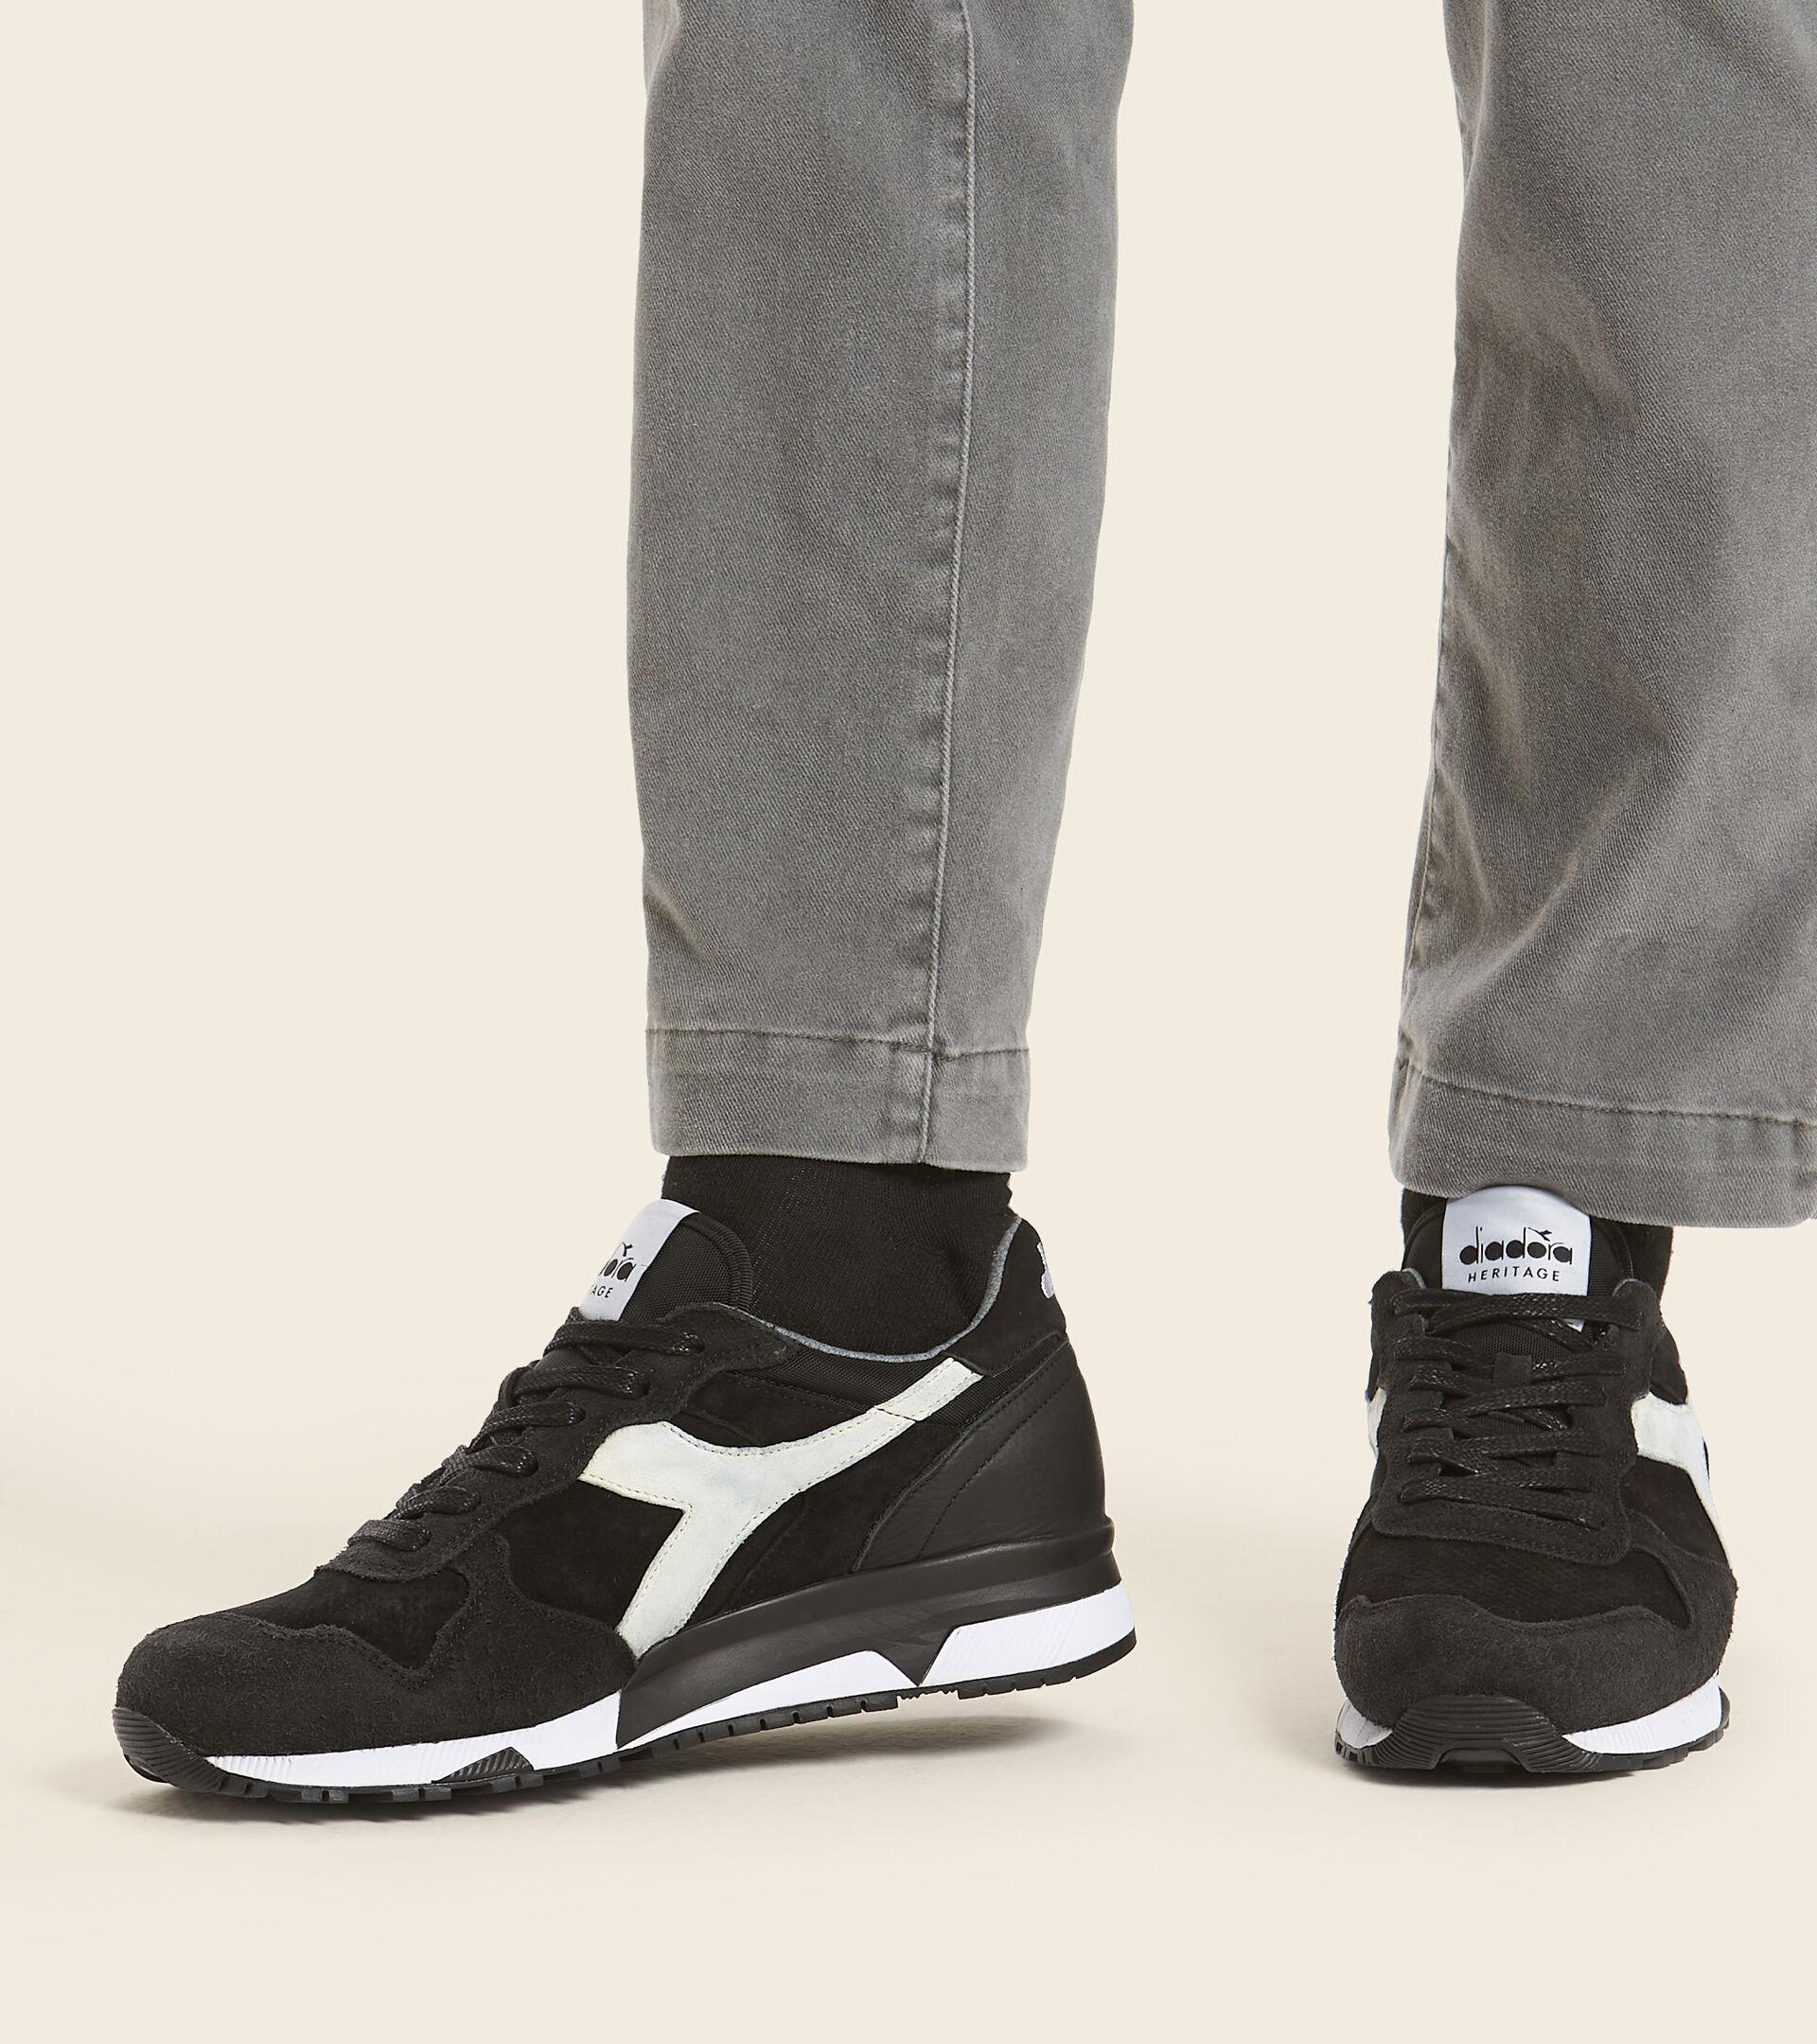 Footwear Heritage UOMO TRIDENT 90 LEATHER BLACK Diadora